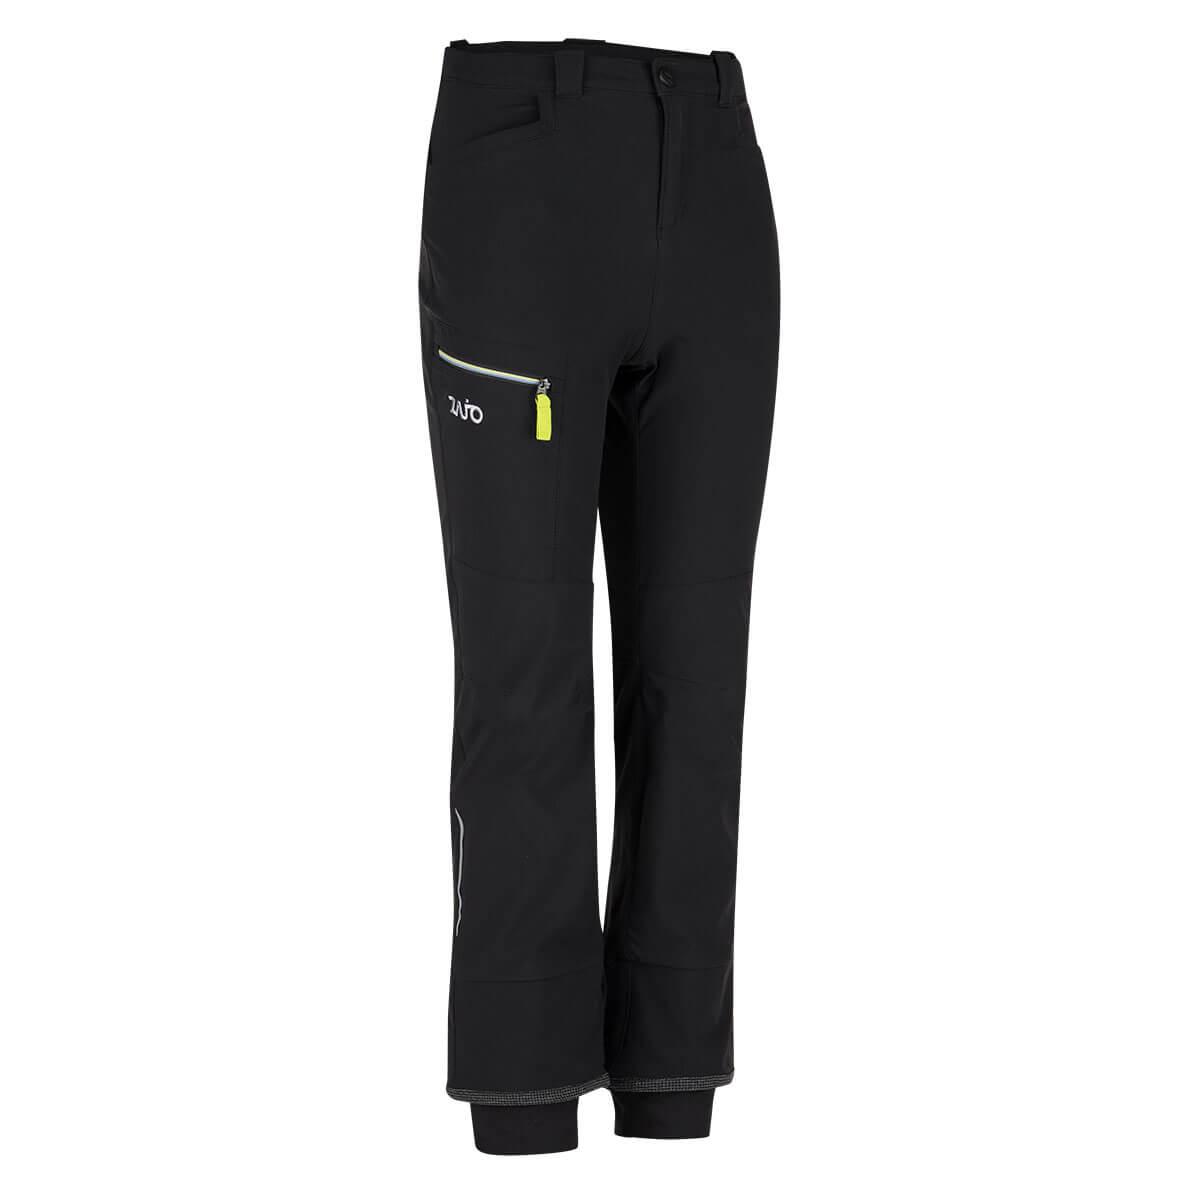 Detské nohavice Argon Kids Pants Black-Teaberry - veľkosť 110 - 116